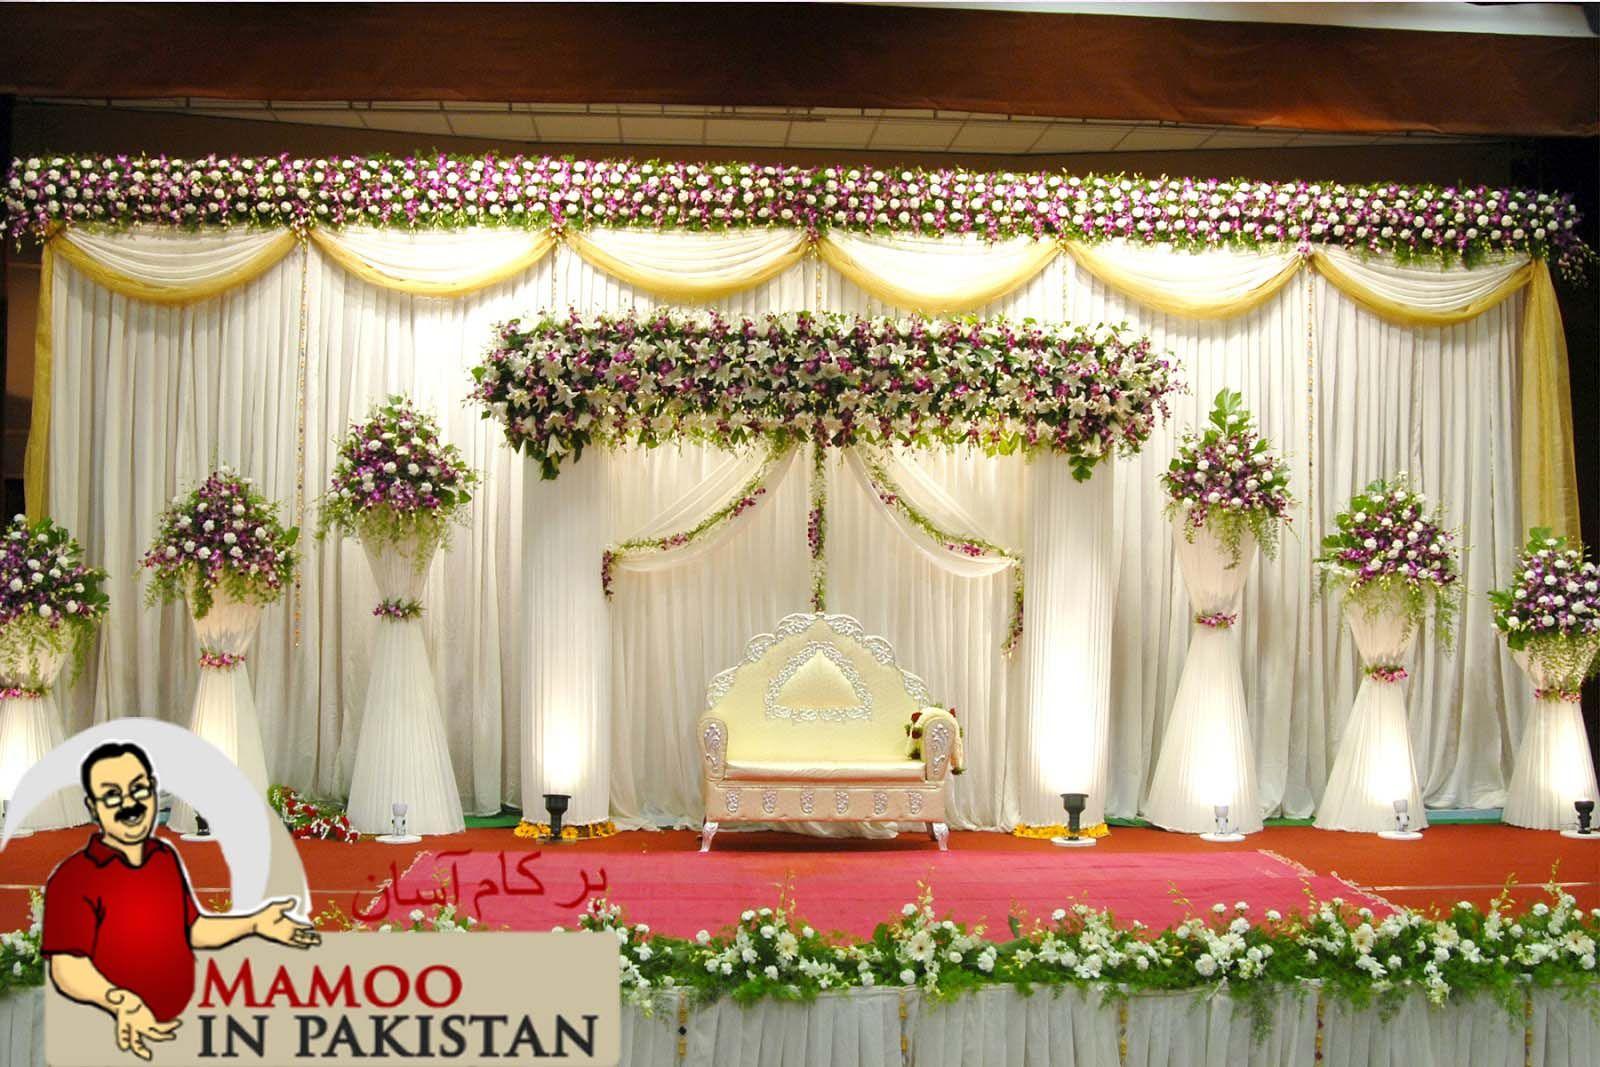 Wedding stage decoration ideas kerala  Pin by MamooInPakistan on Stuff to Buy  Pinterest  Wedding stage